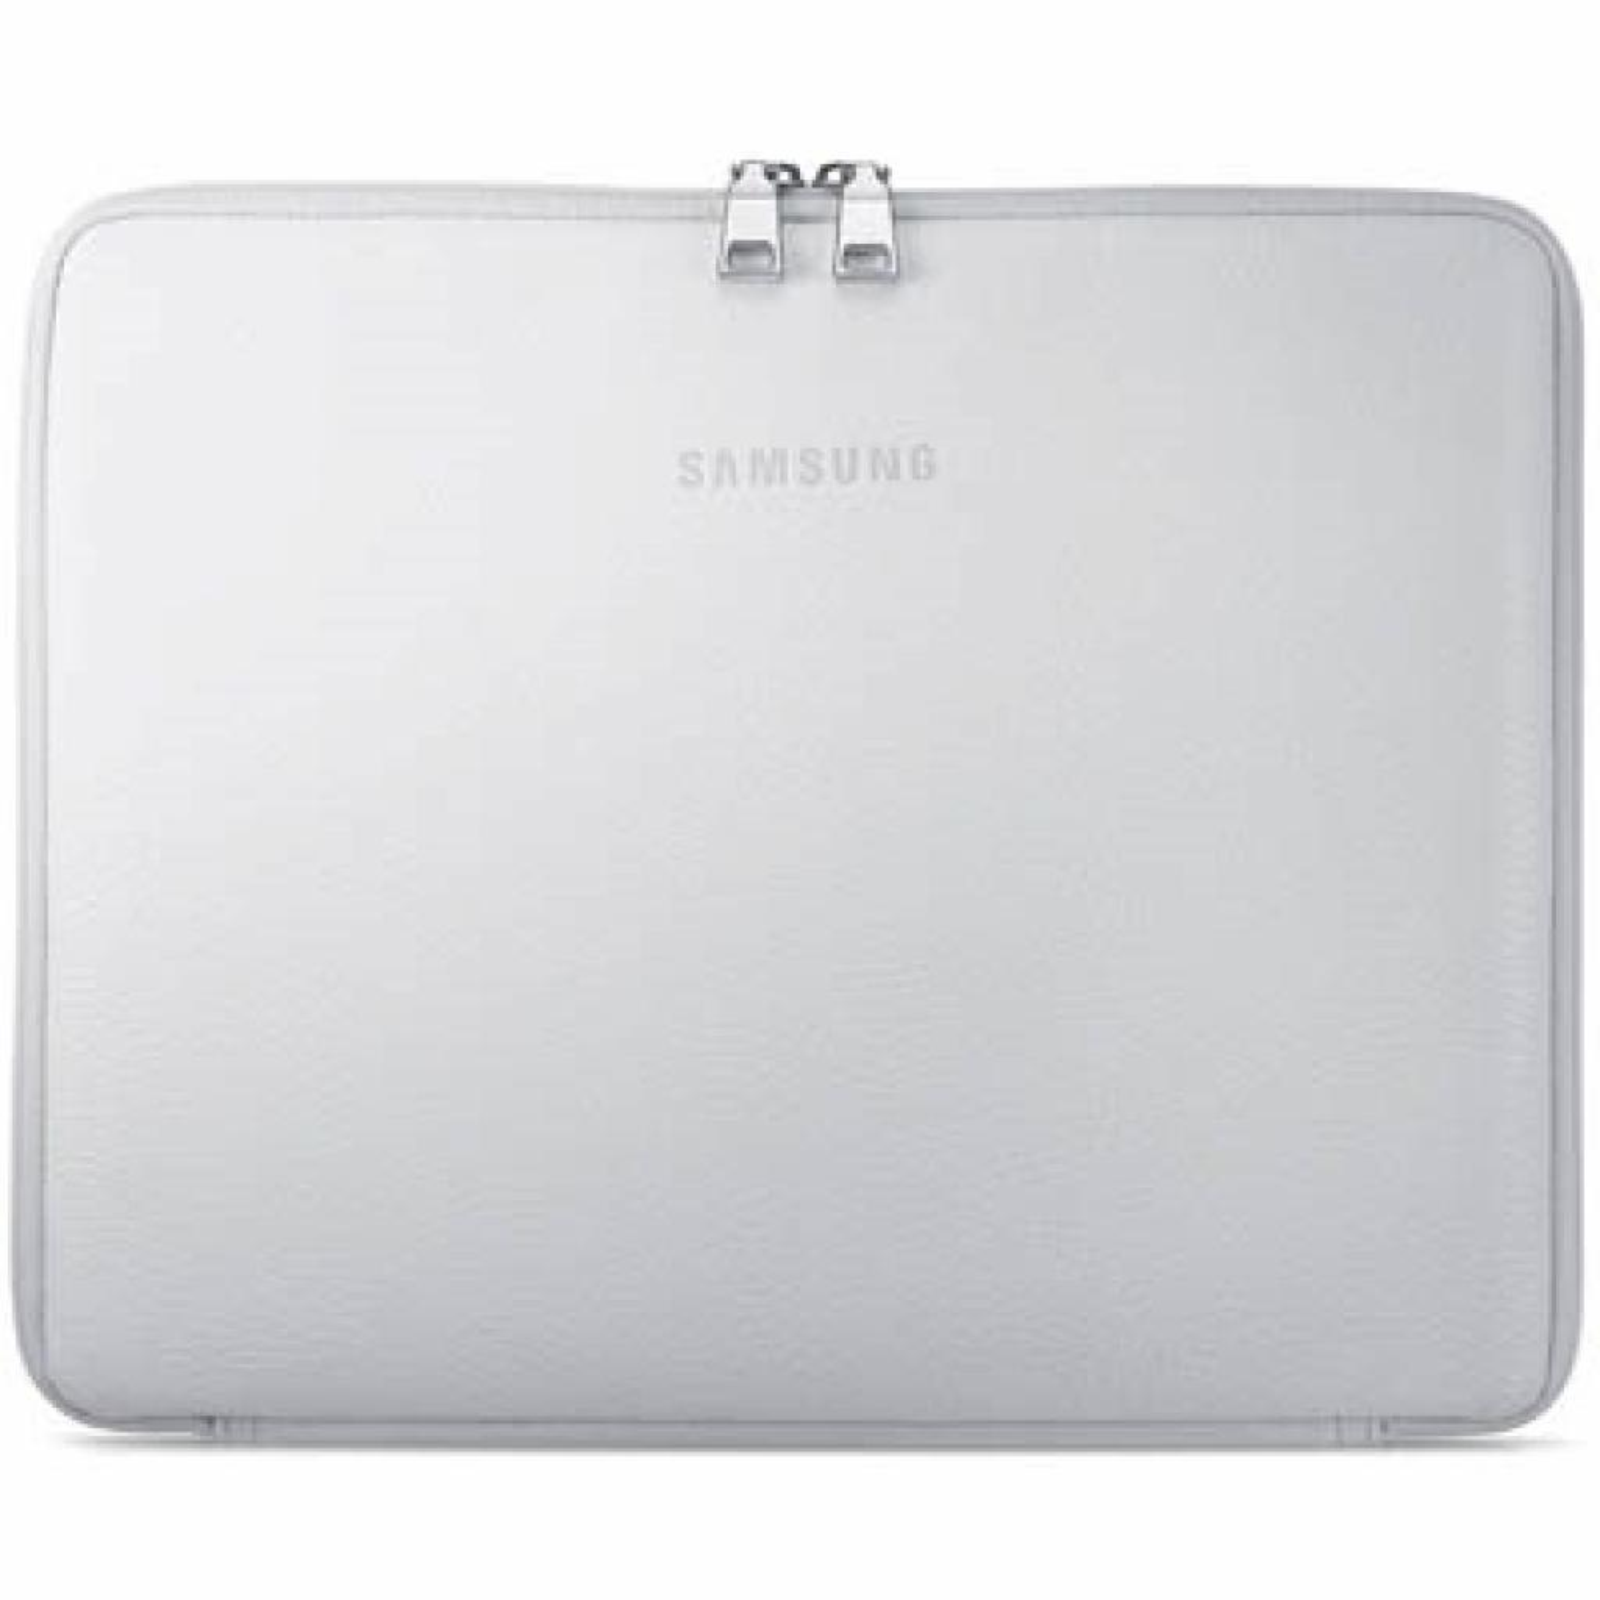 Чехол для планшета Samsung 11.6 XE700/XE500/XE300 Smart PC Case (AA-BS5N11W/UA)